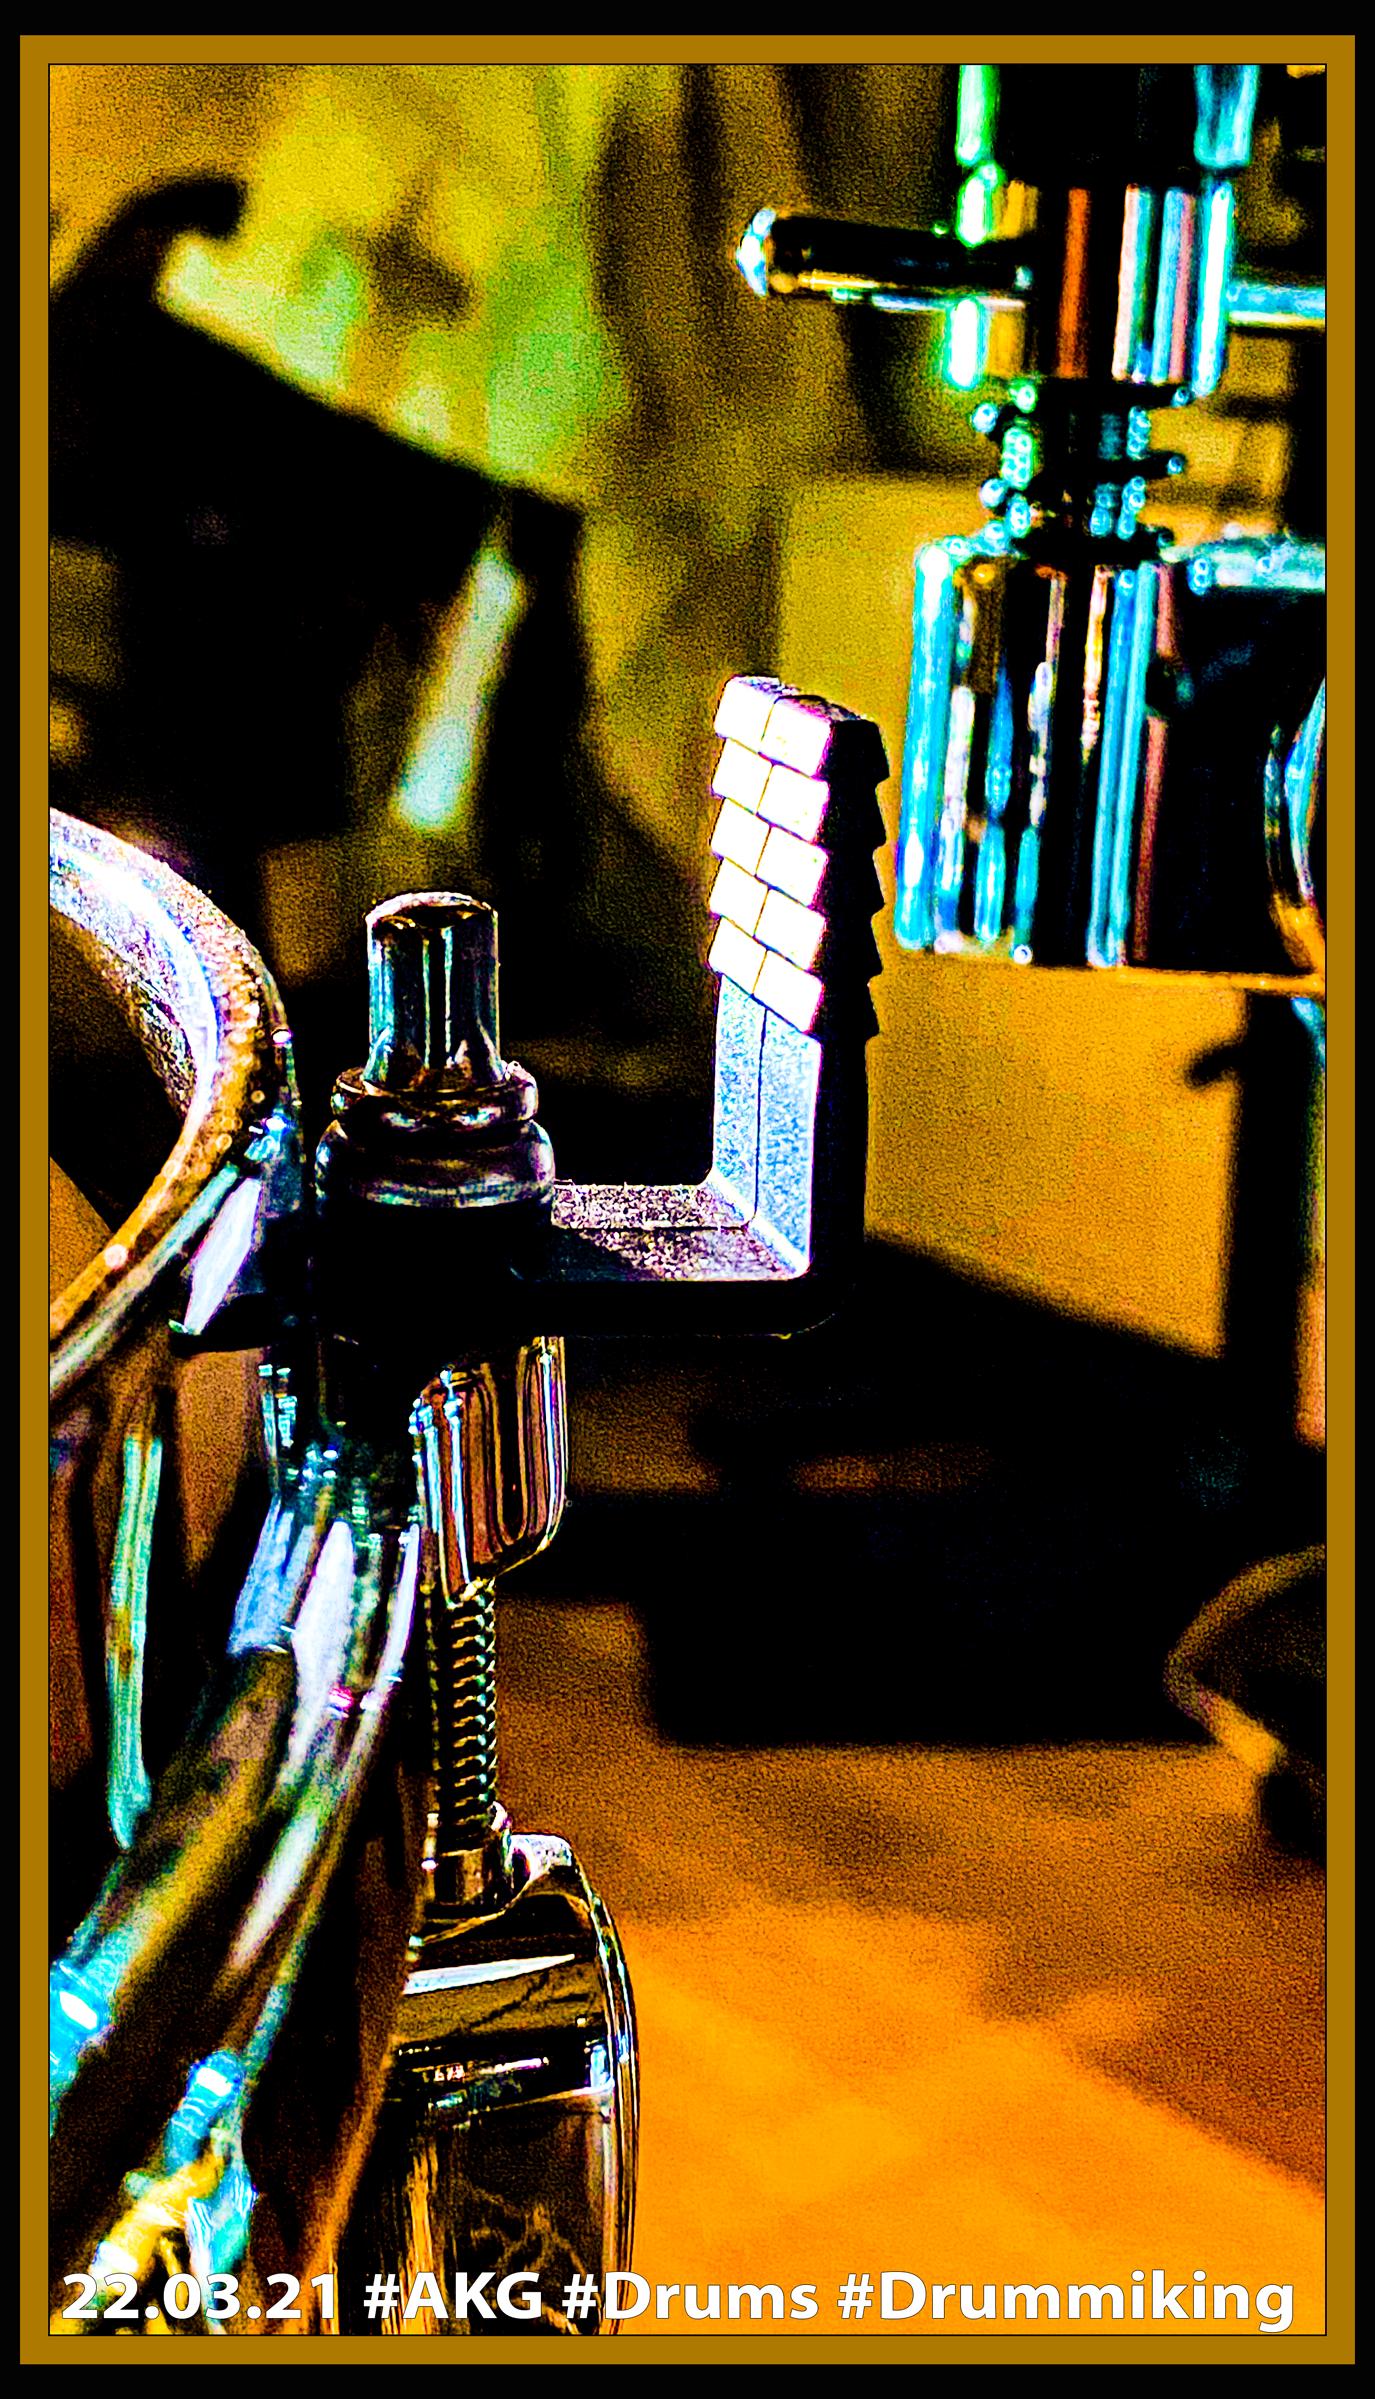 22.03.21 Befestigungswinkel an Snareschraube #AKG 'Drums #Drummiking #Ersatzteile